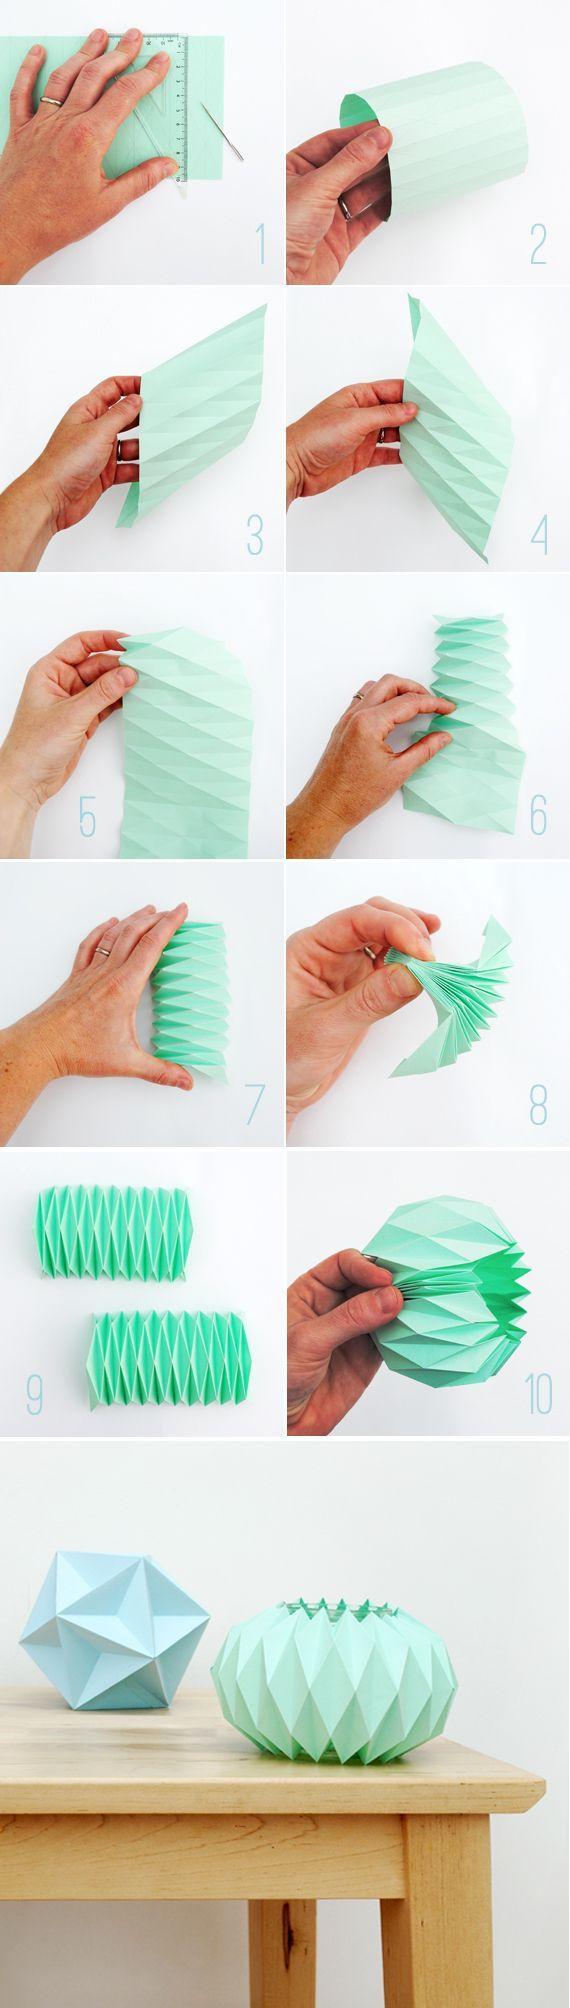 DIY Accordion paper folding candle holder diy crafts craft ideas ...